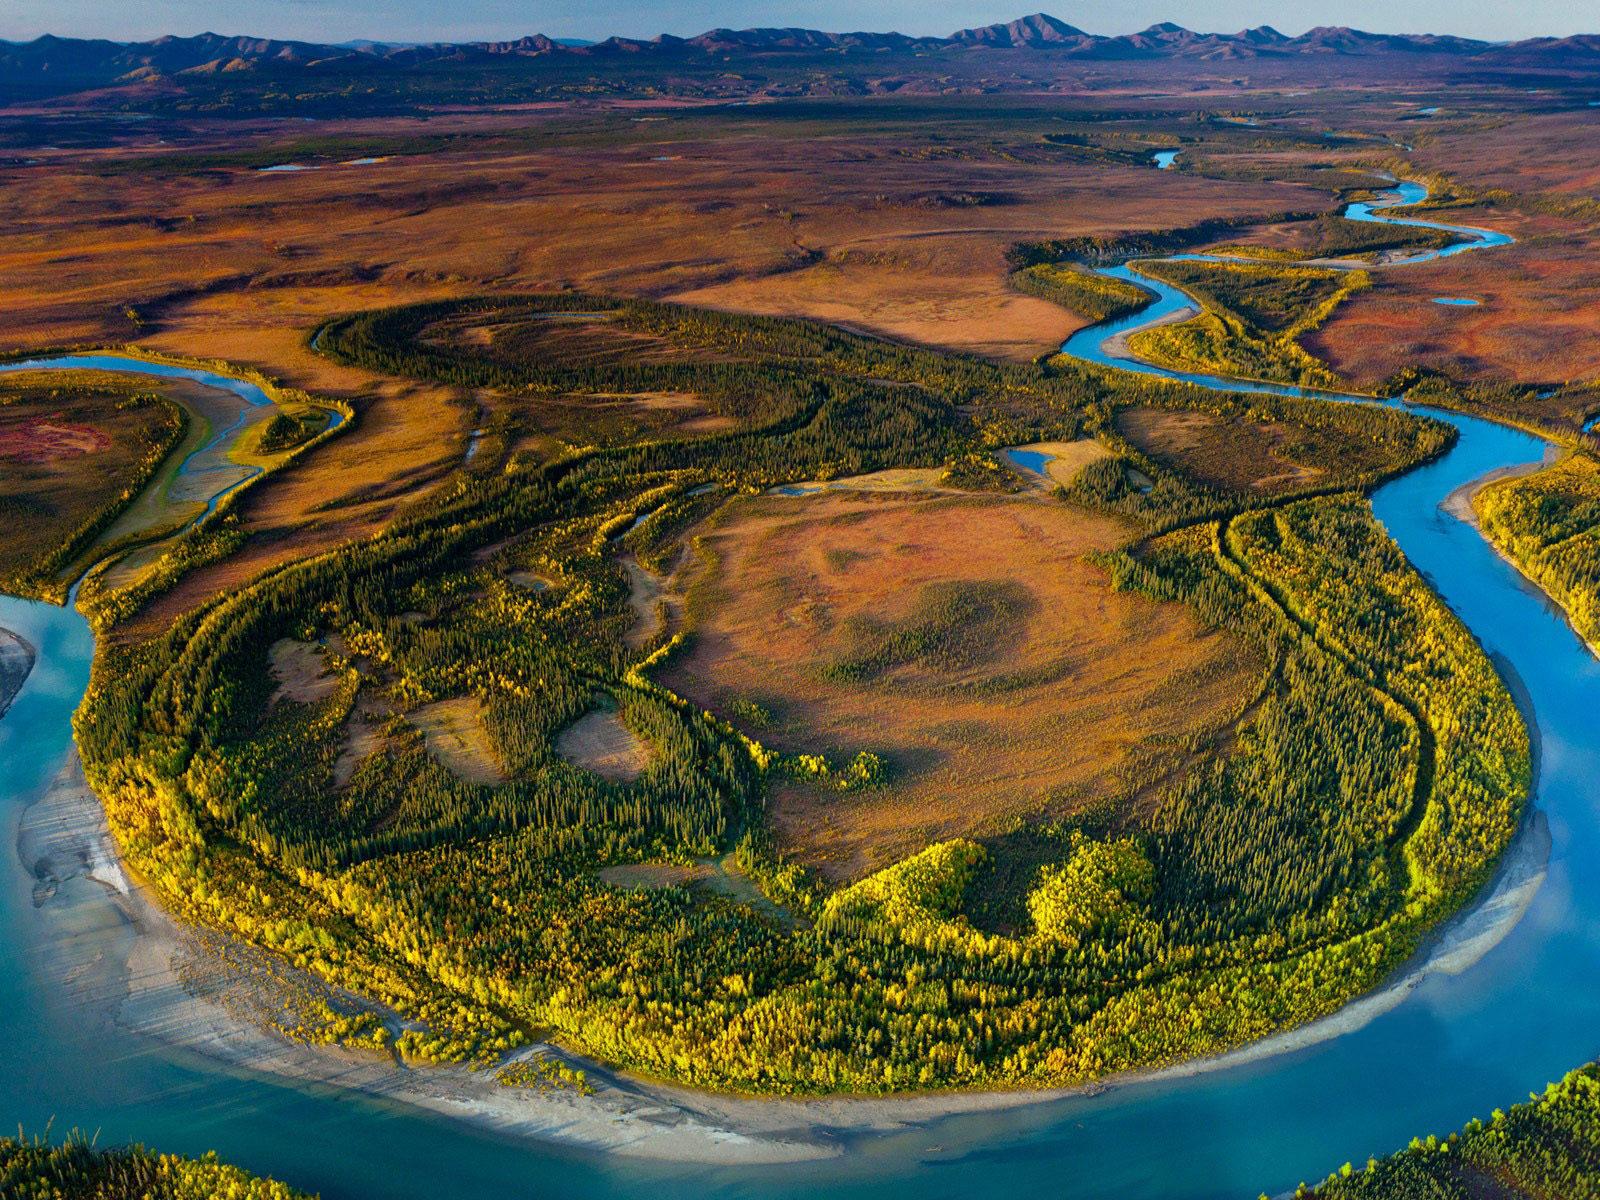 Fall River Wallpaper Gates Of The Arctic National Park And Preserve Alaska